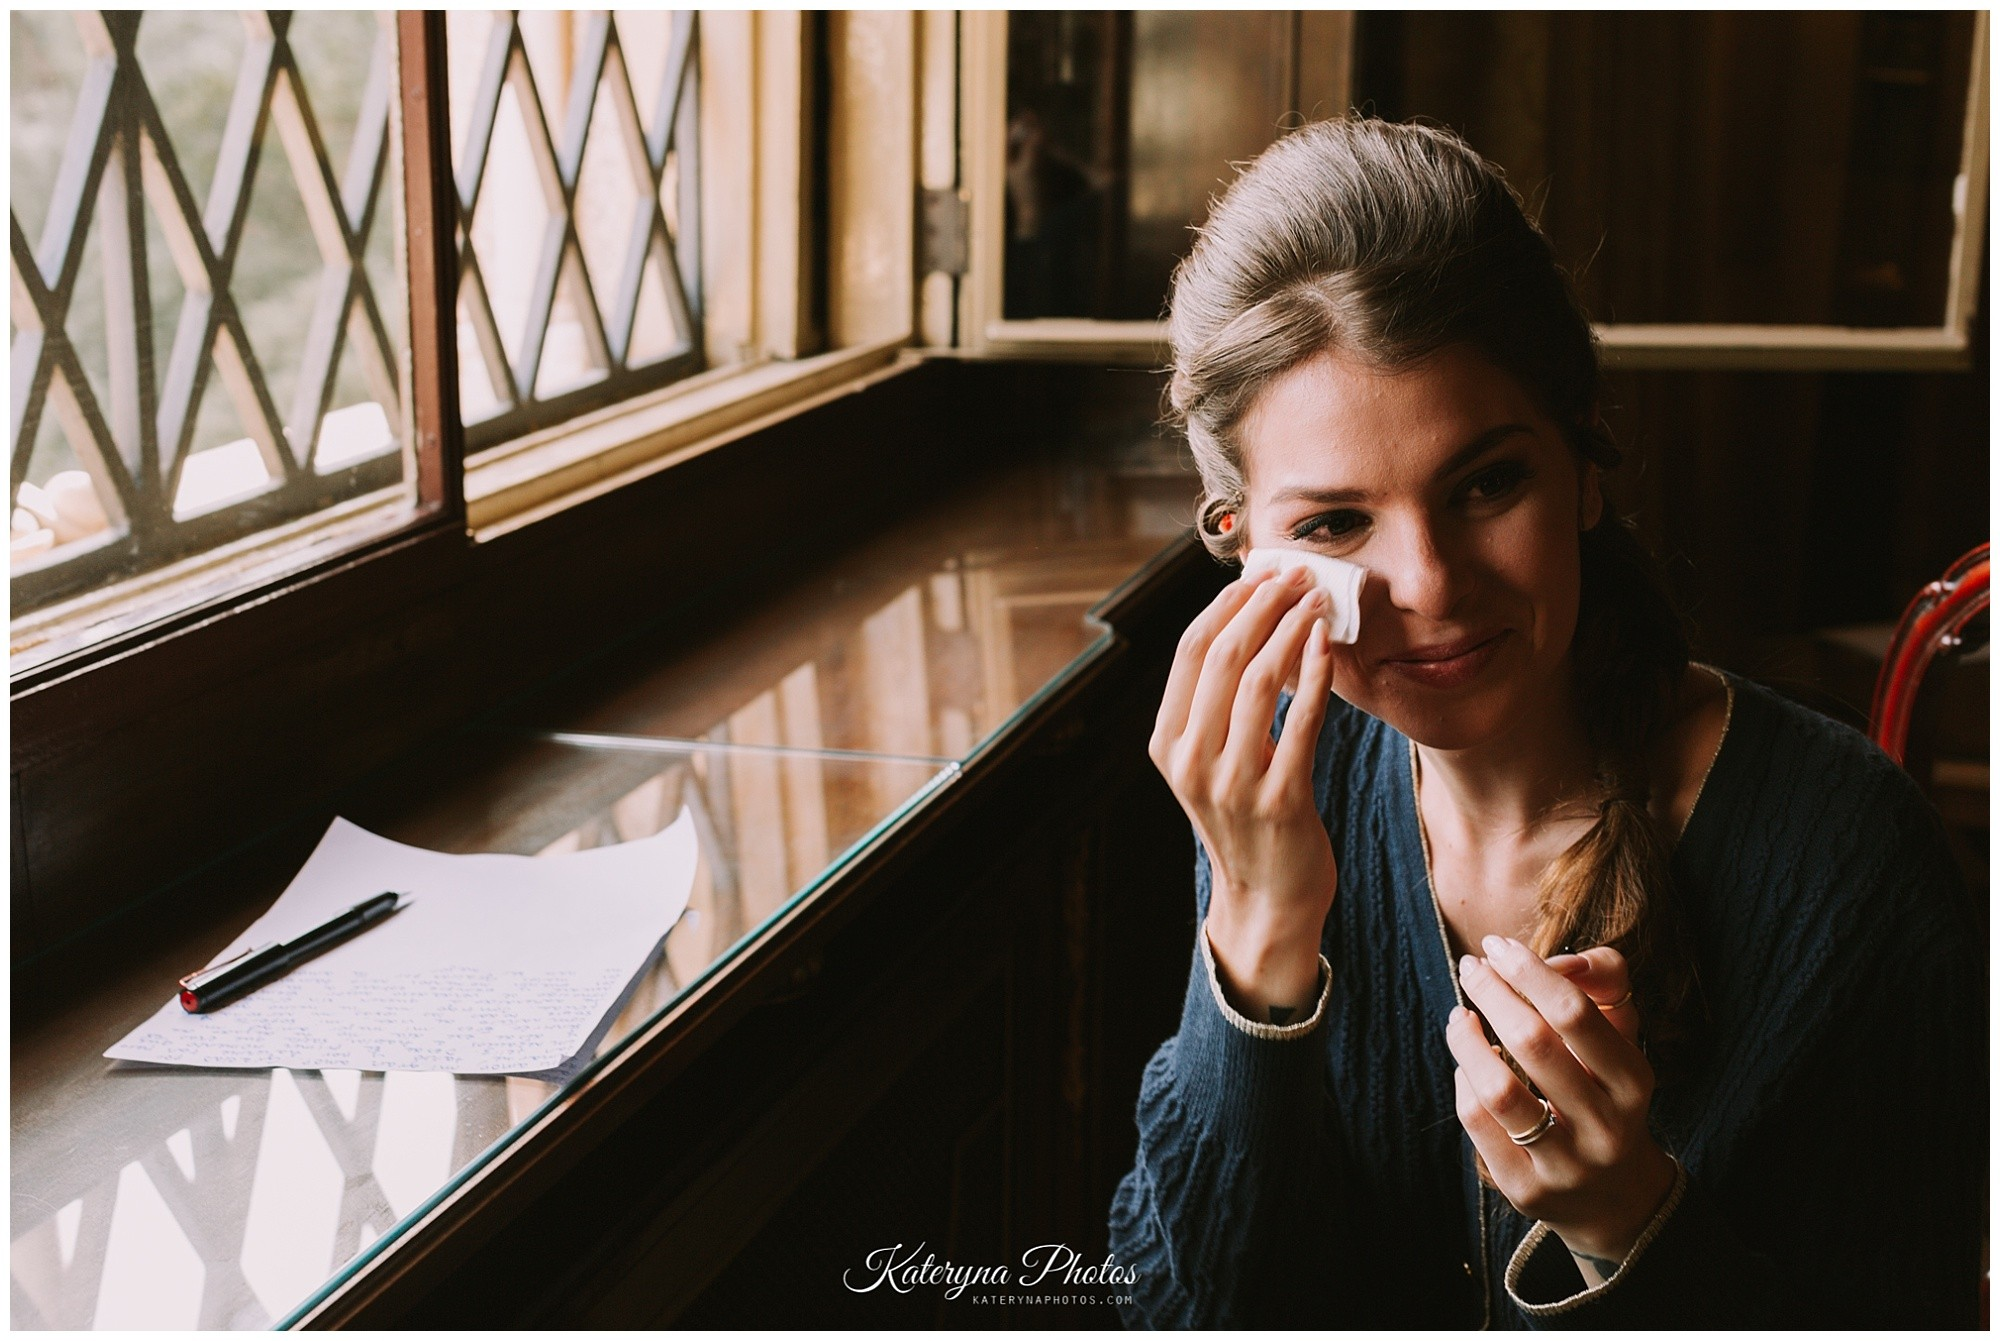 Kateryna-photos-photographe-boda-wedding-barcelona-bell-reco-catalunya 0120.jpg